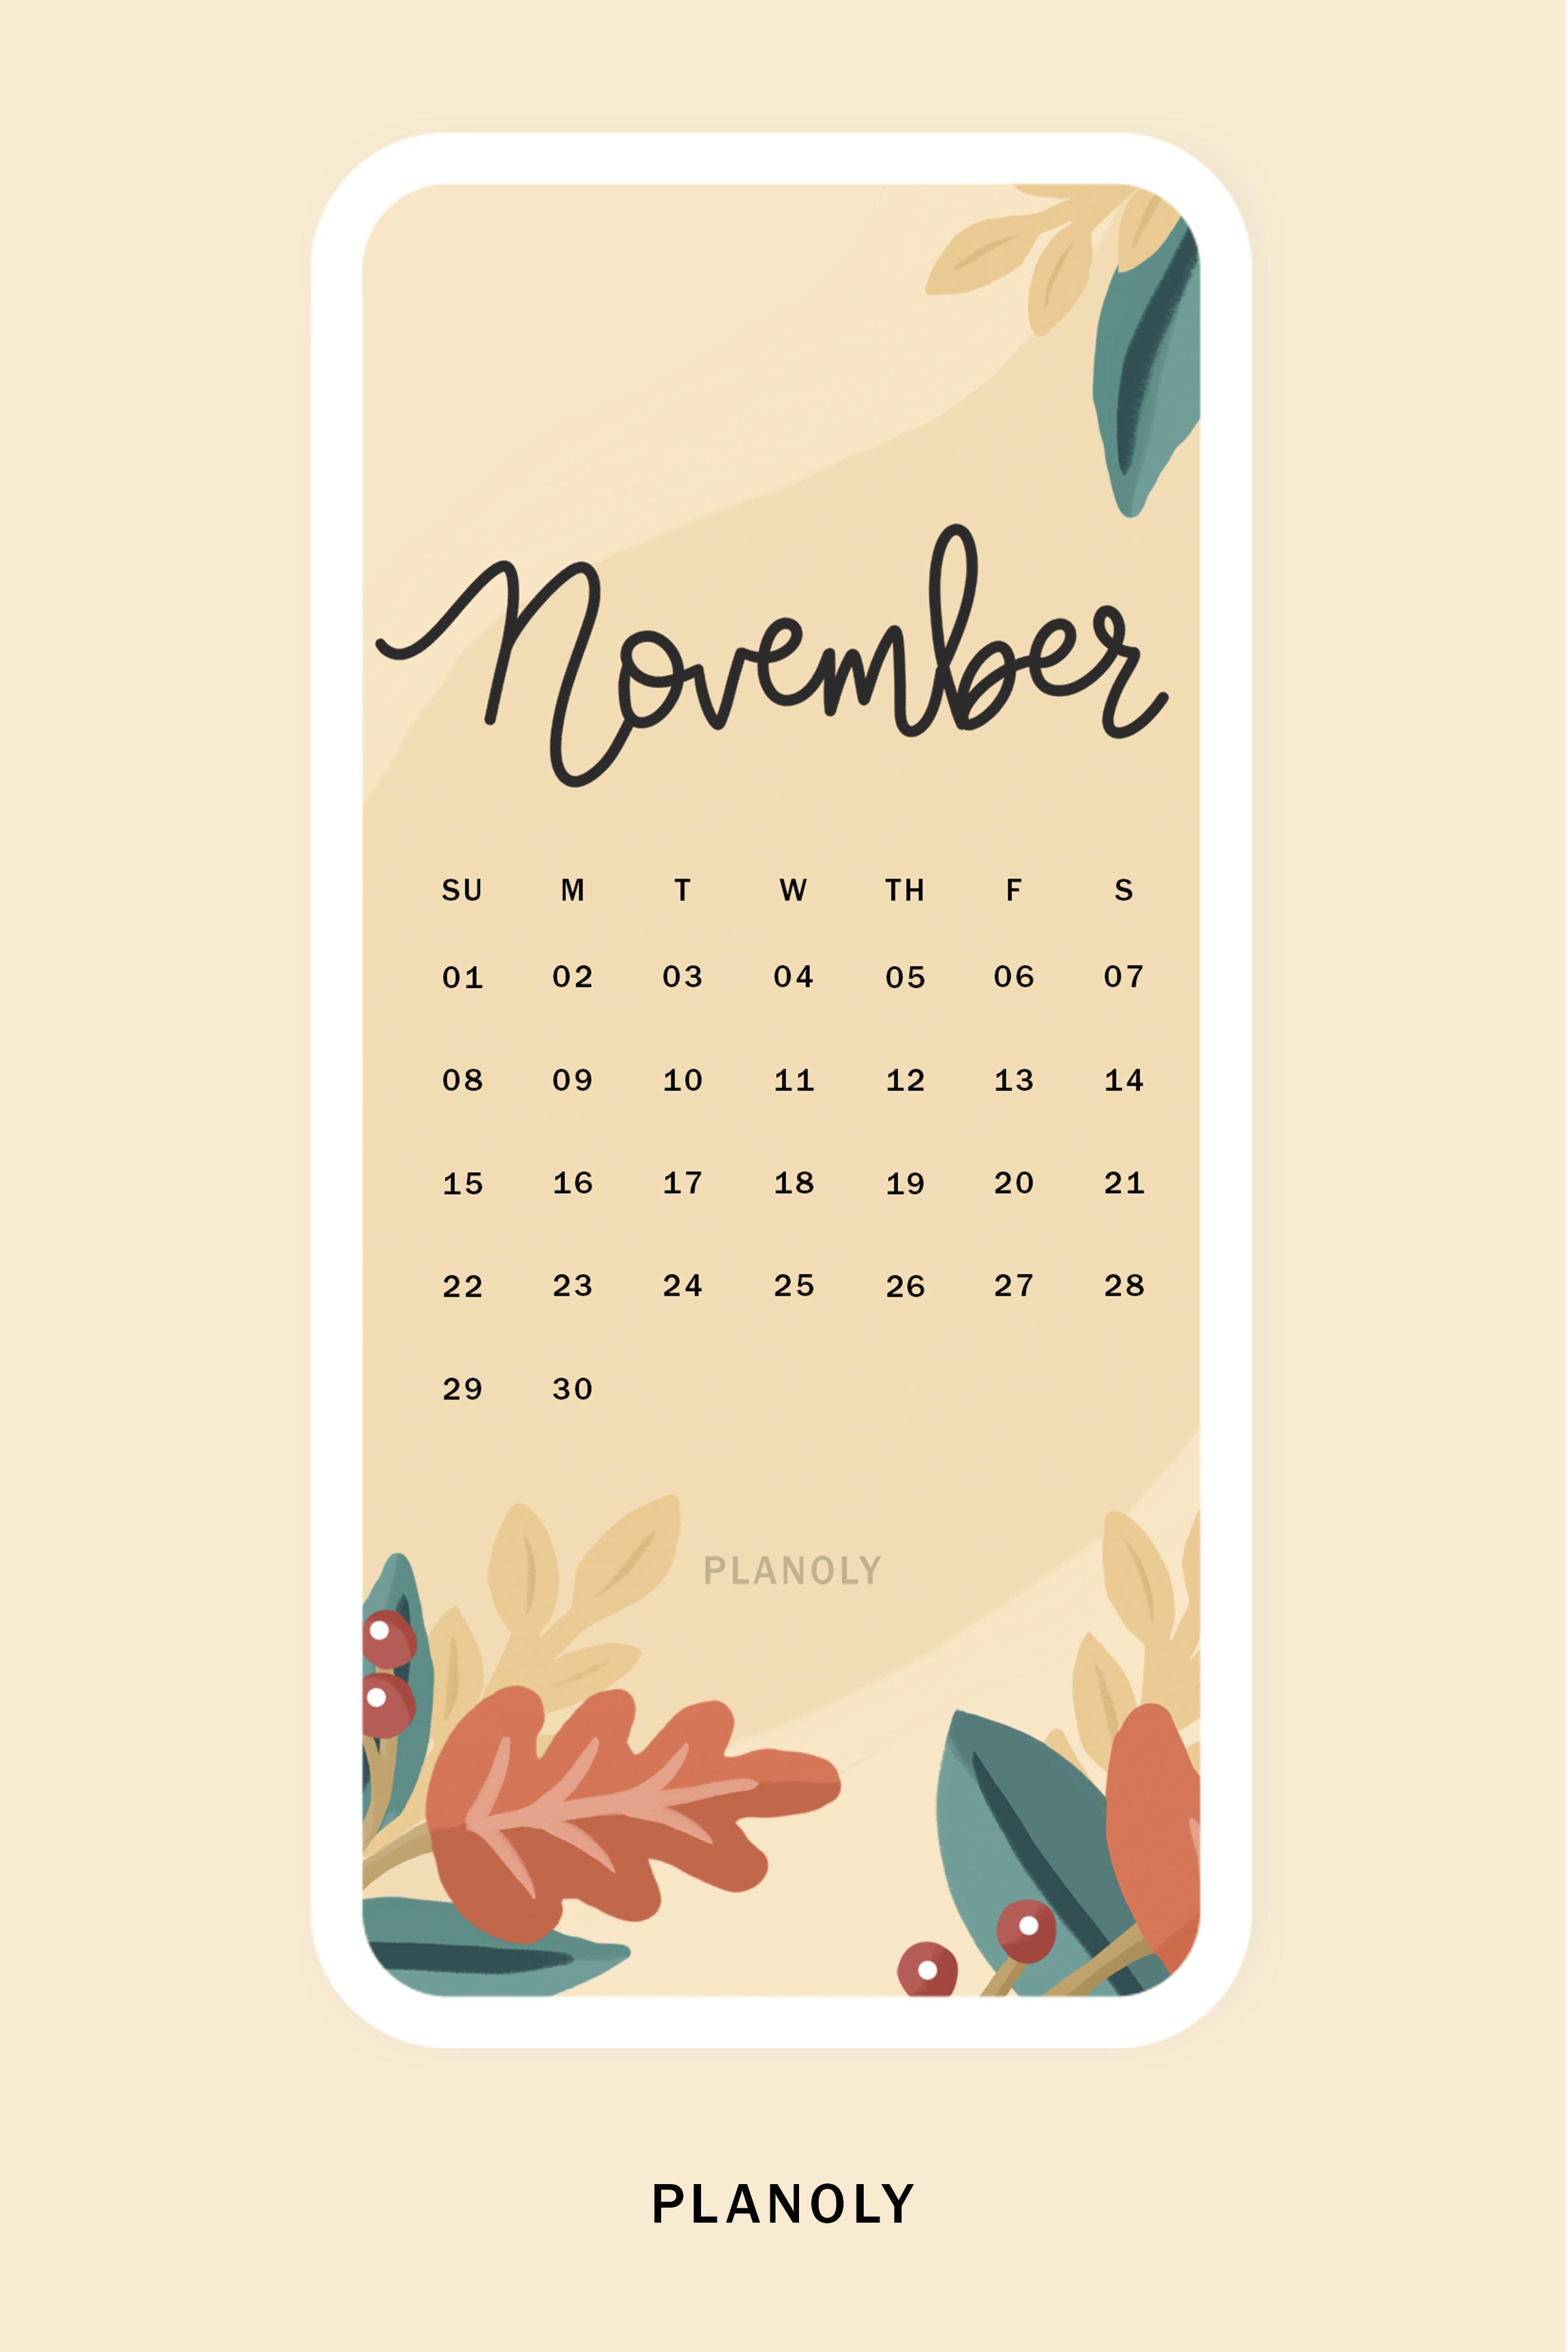 PLANOLY-blog post-Q4 2020 Content Calendars- Image 2